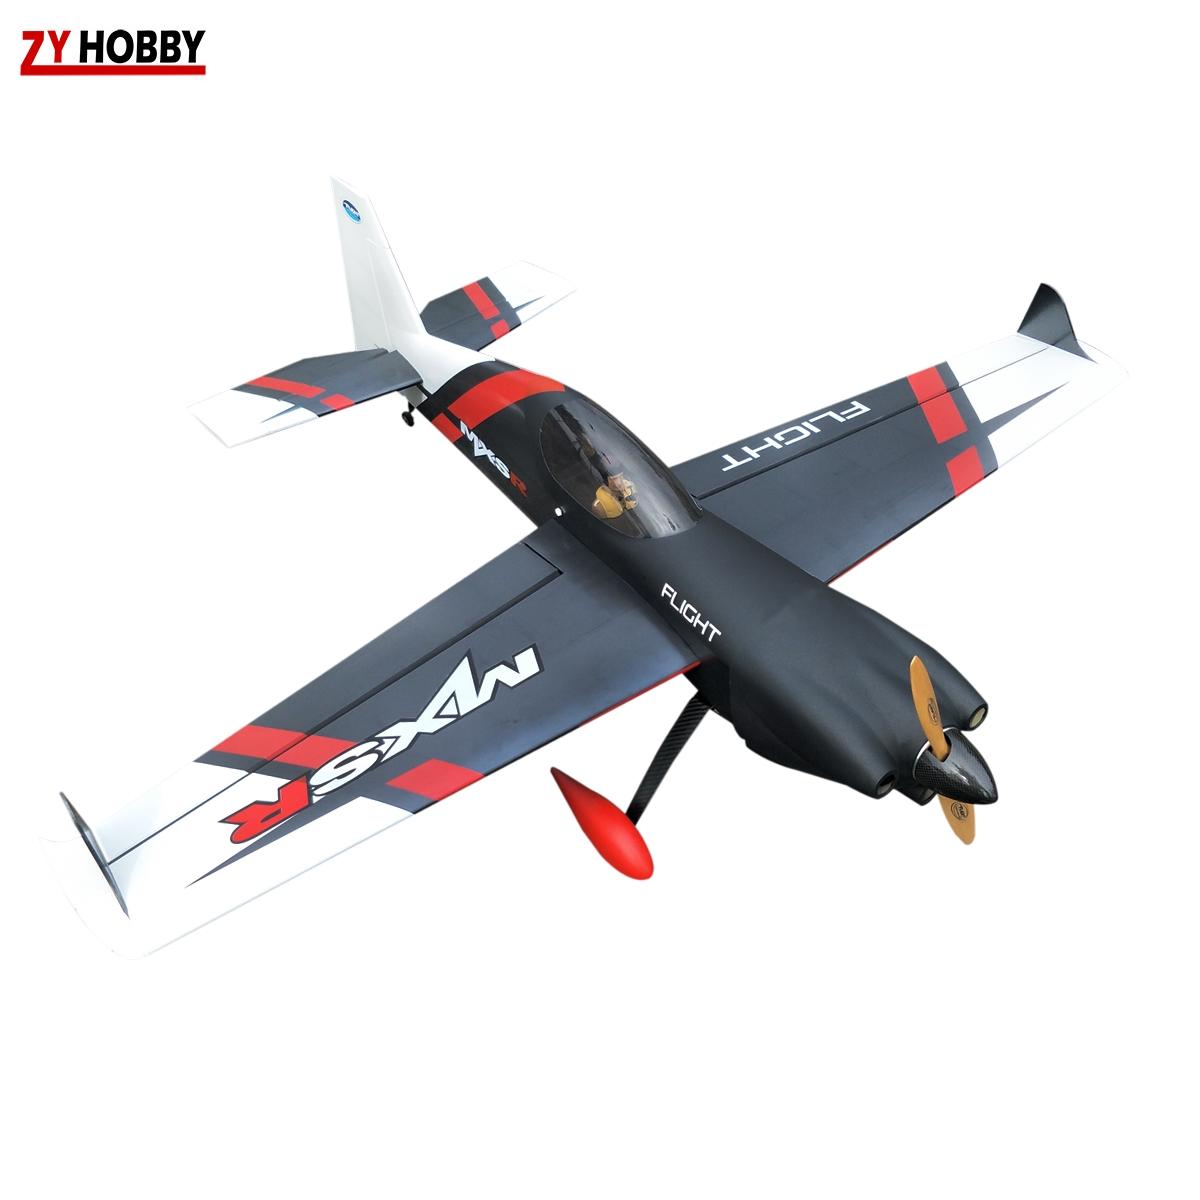 MXS-R 64inch/1625mm 20cc Gasoline Remote Control Plane RC Aircraft Kits ARF  Balsa Wood Black